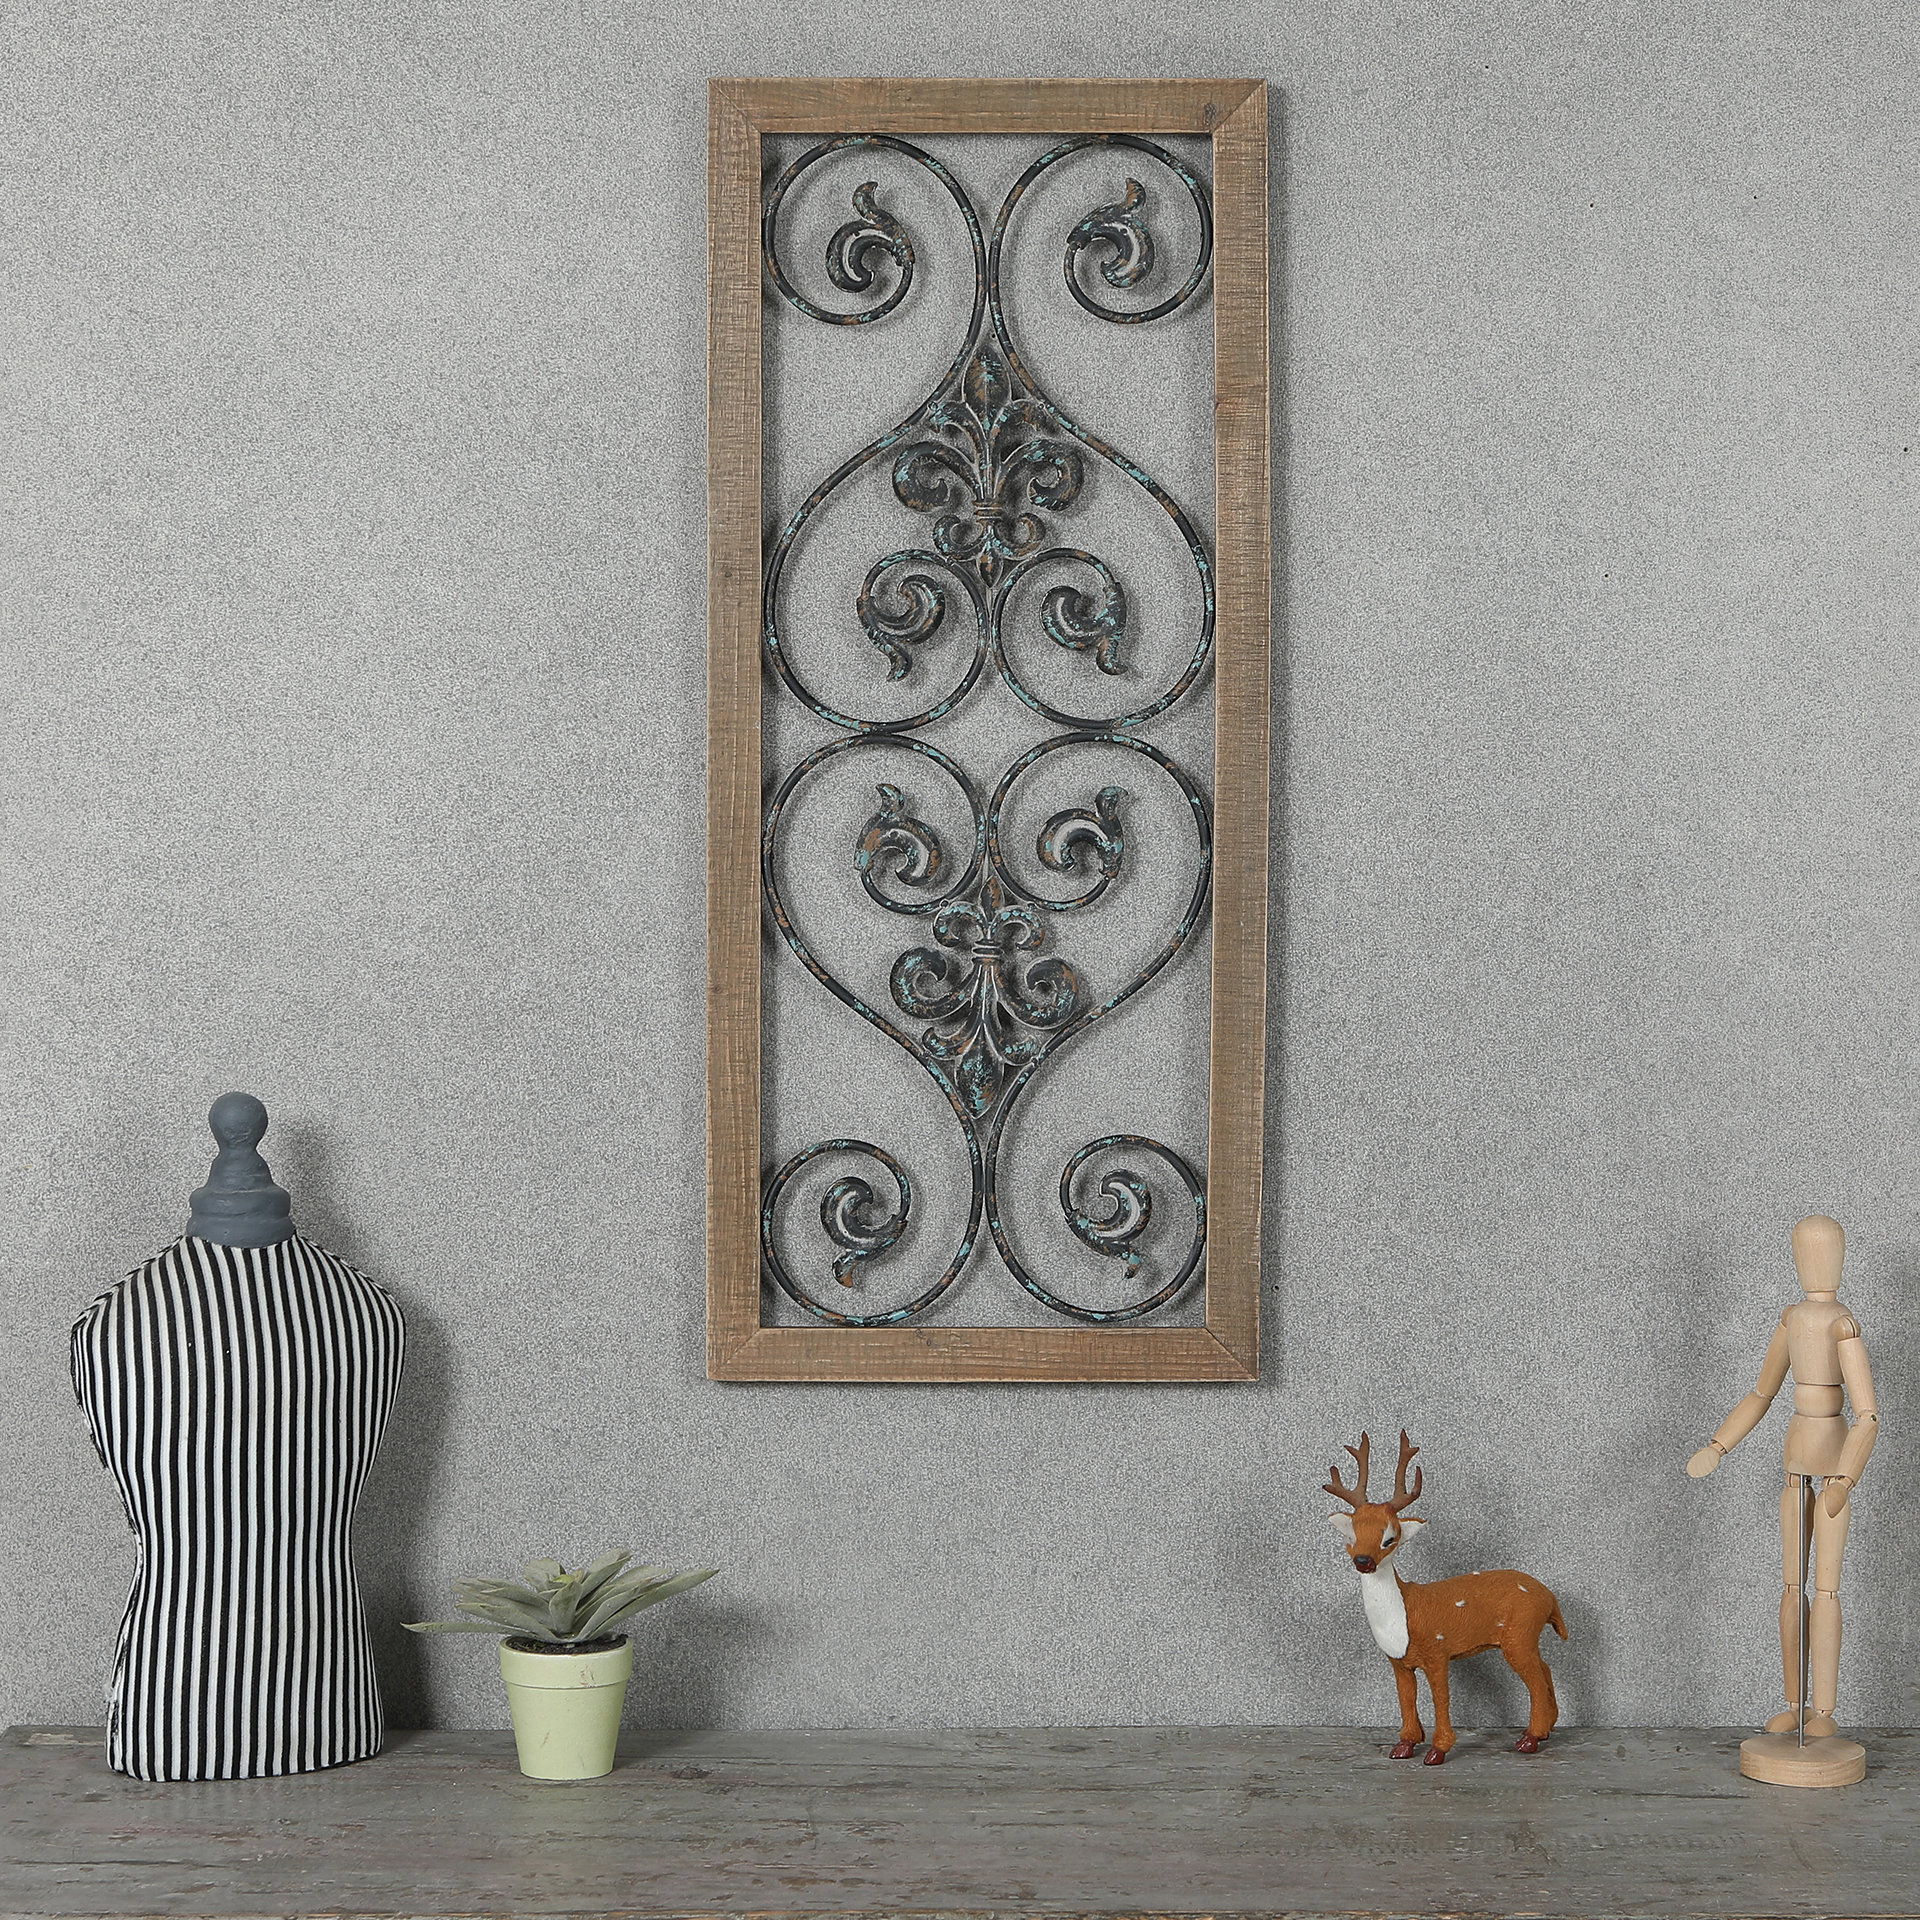 Black Metal Scroll Wall Decor | Wayfair With Regard To Ornamental Wood And Metal Scroll Wall Decor (View 8 of 30)